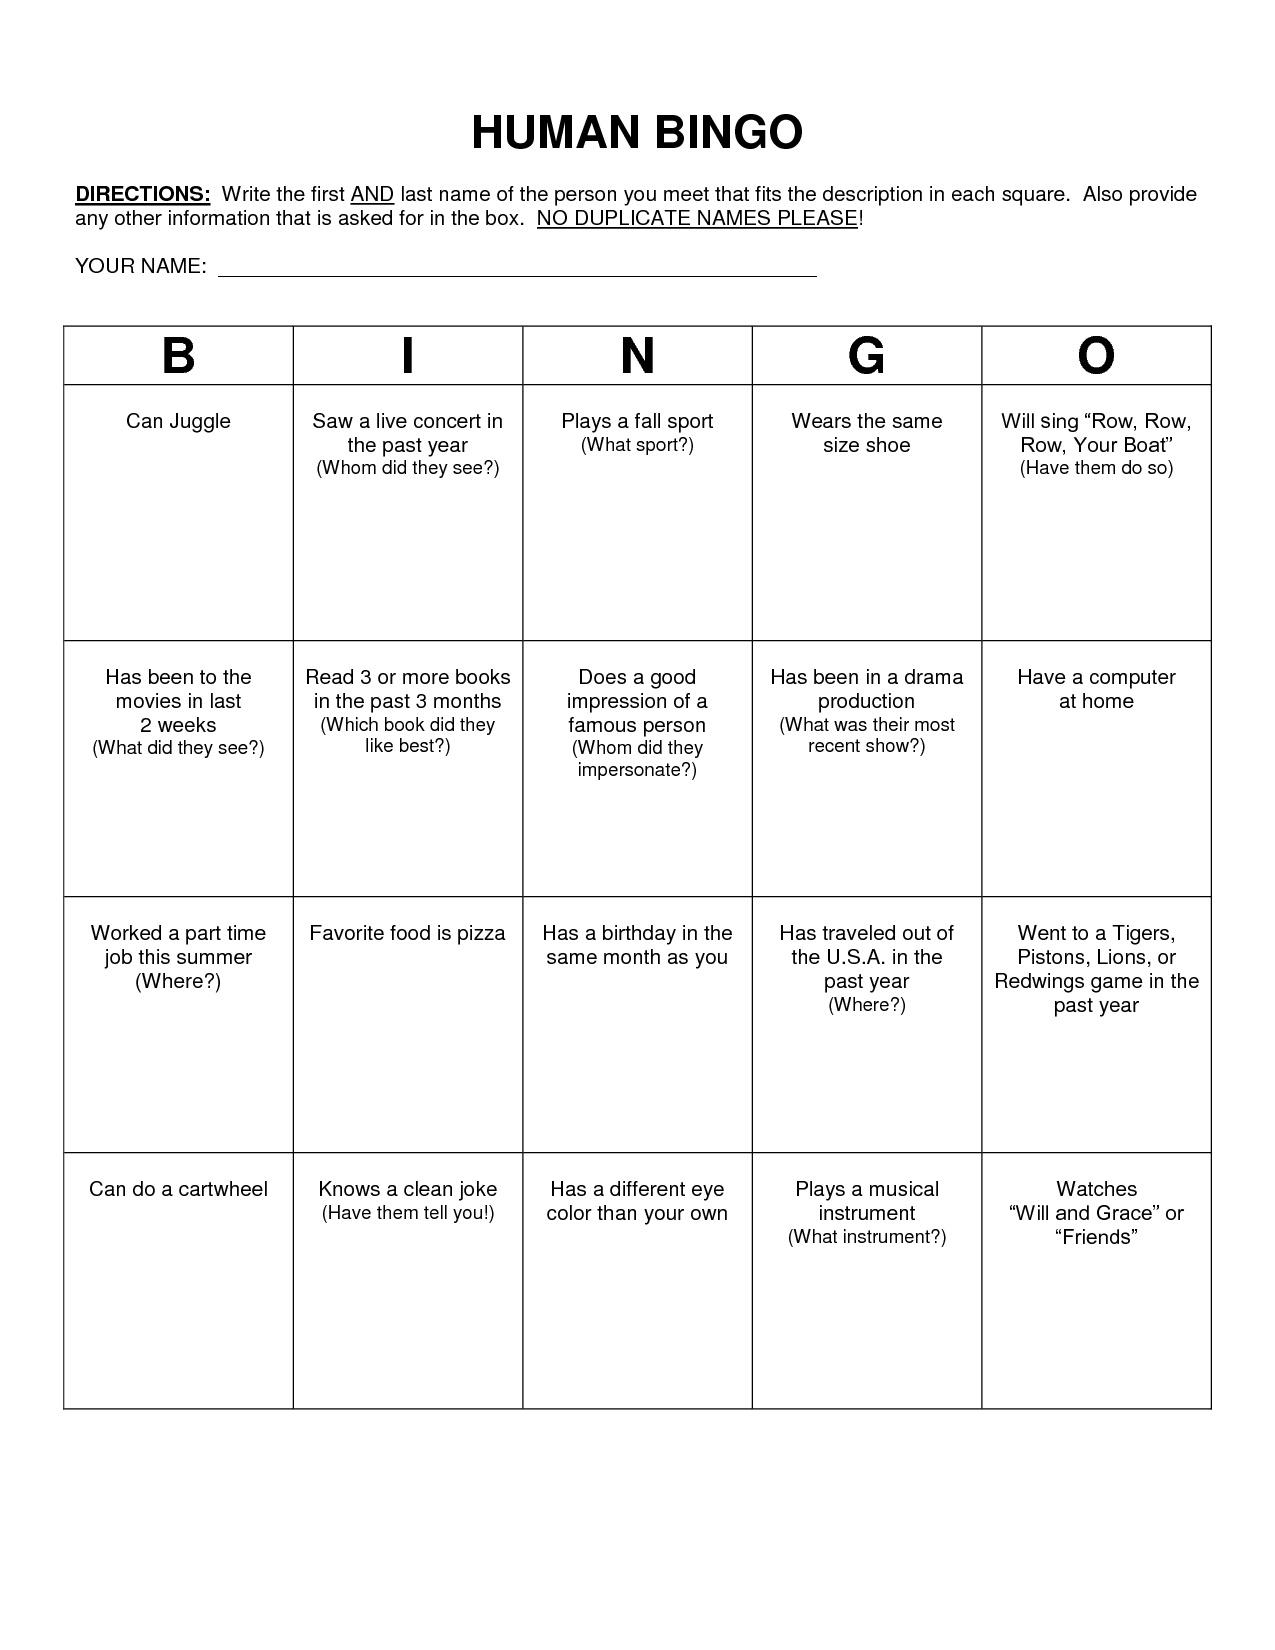 Bingo Spreadsheet Throughout Bingo Spreadsheet – Spreadsheet Collections